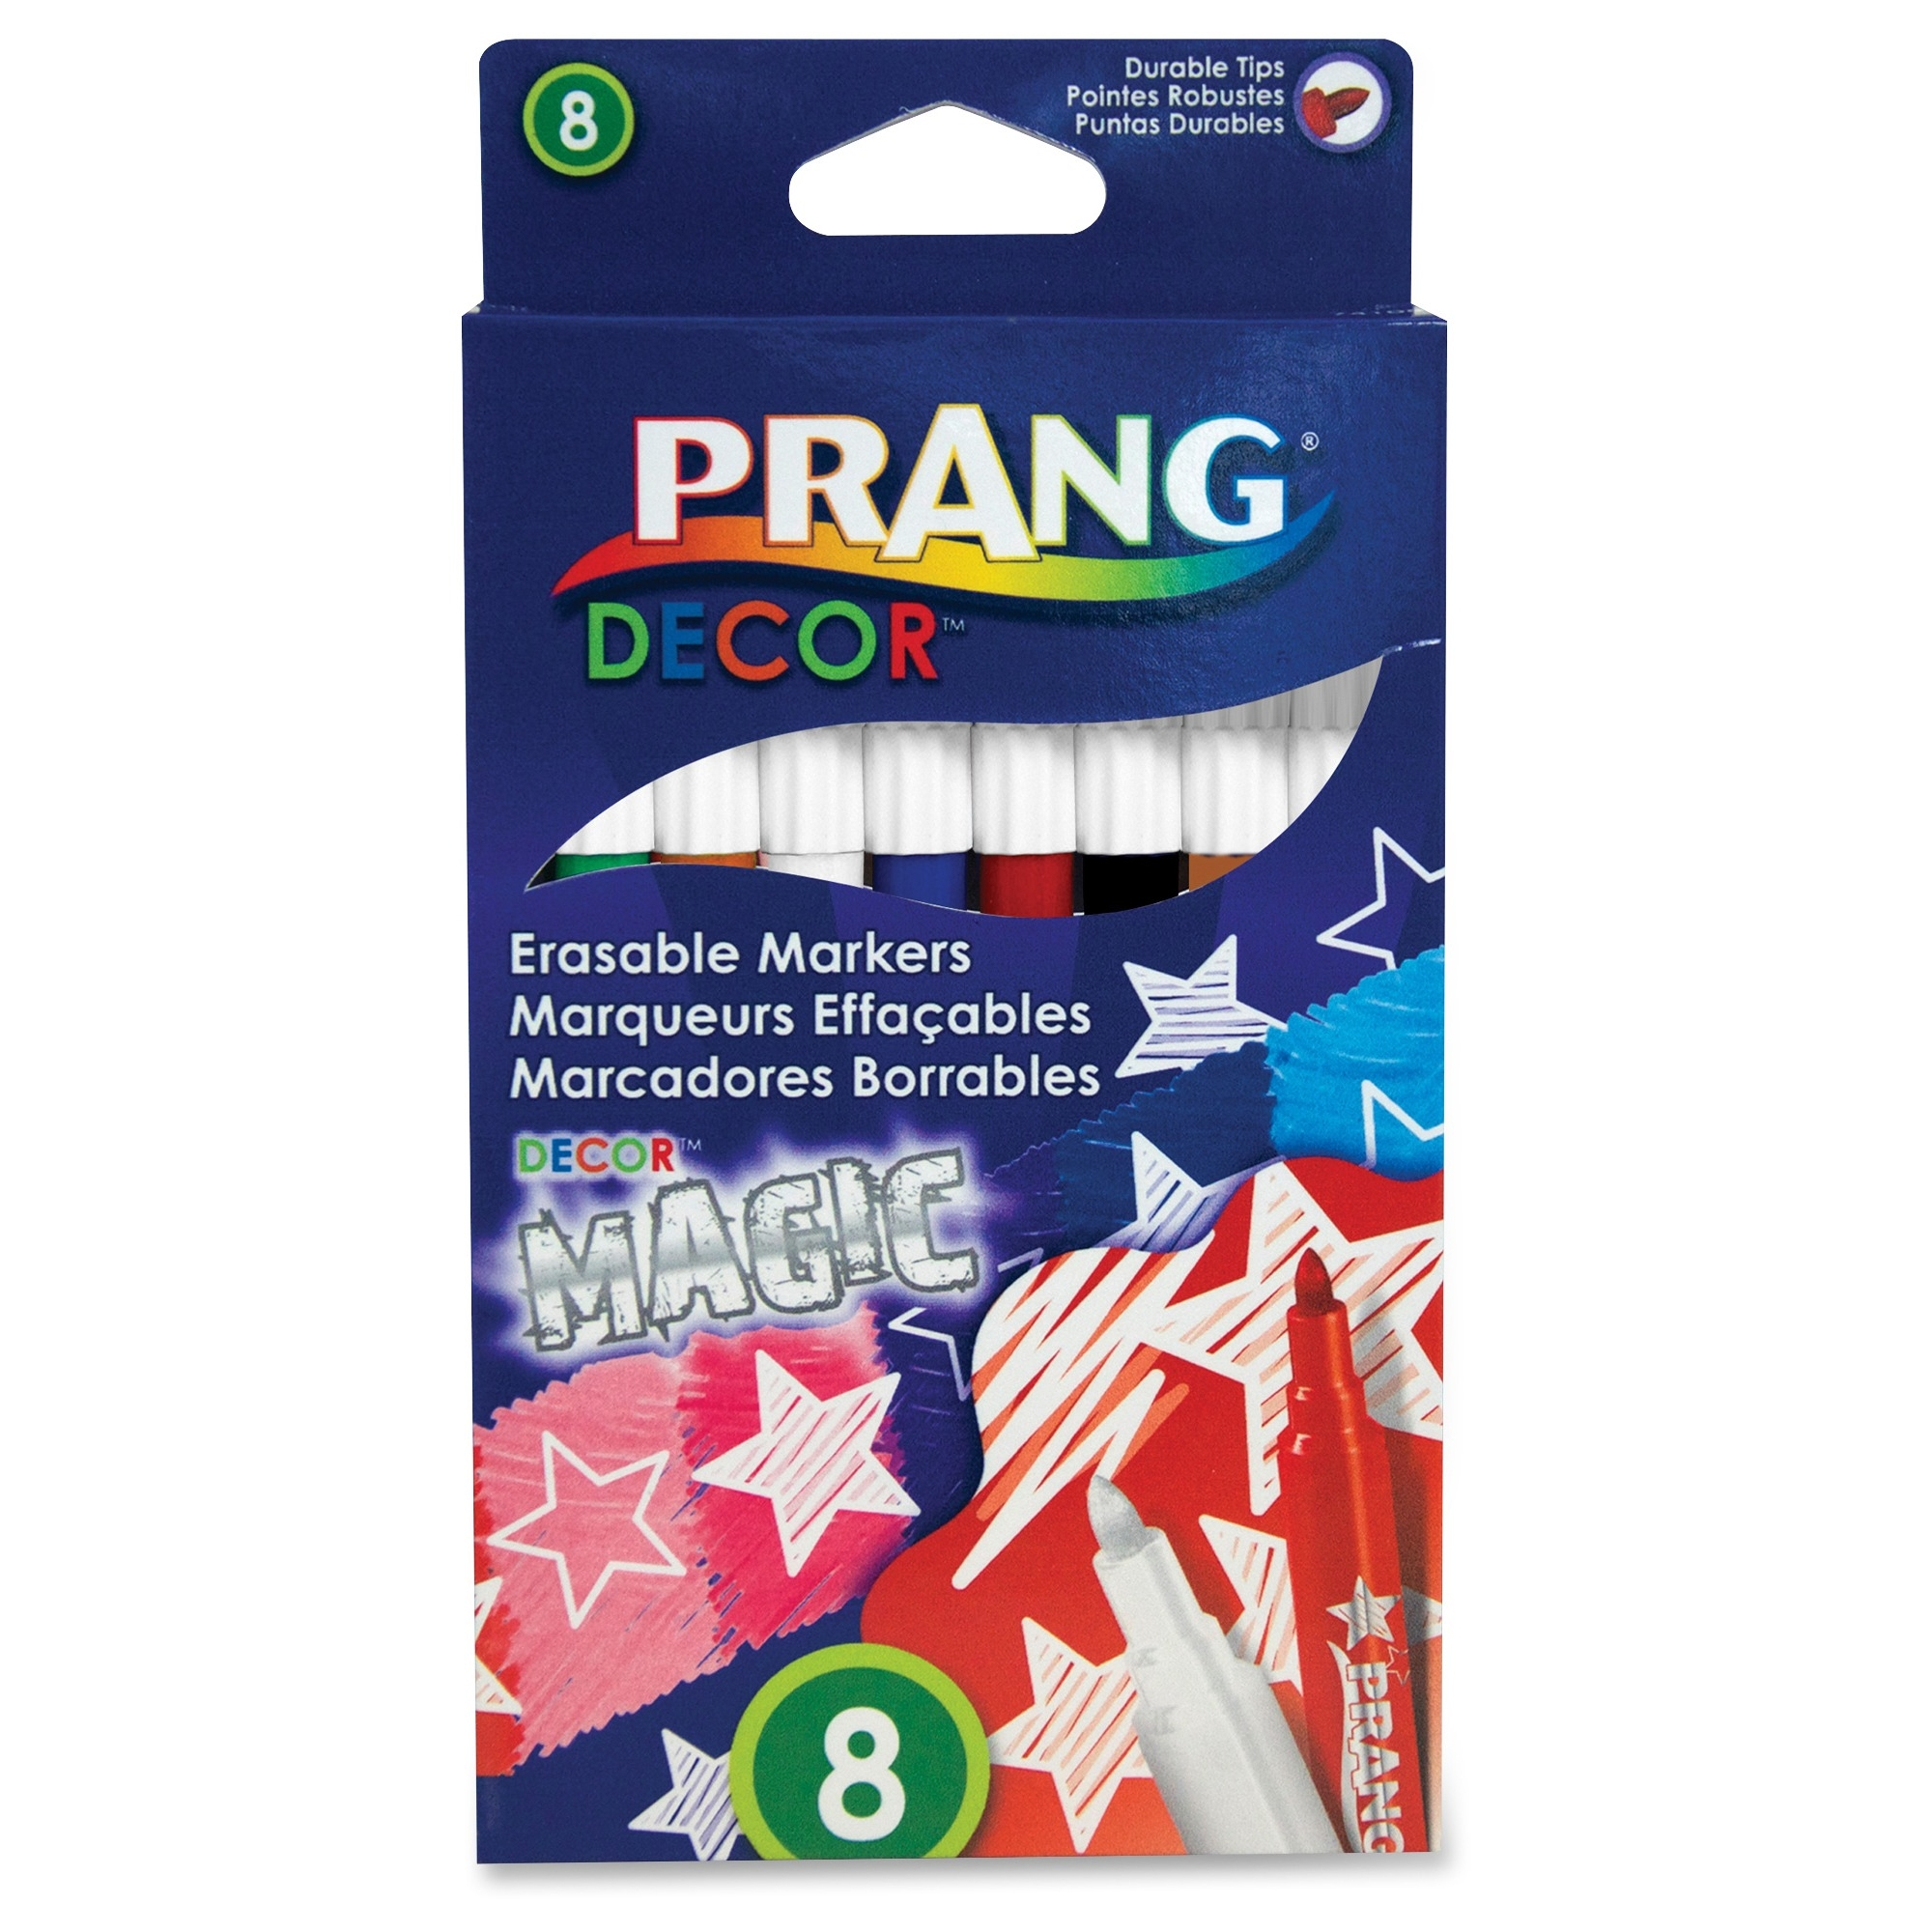 Prang Decor Magic Erasable Markers - Assorted Water Based Ink - 8 / Set (dix-74108)